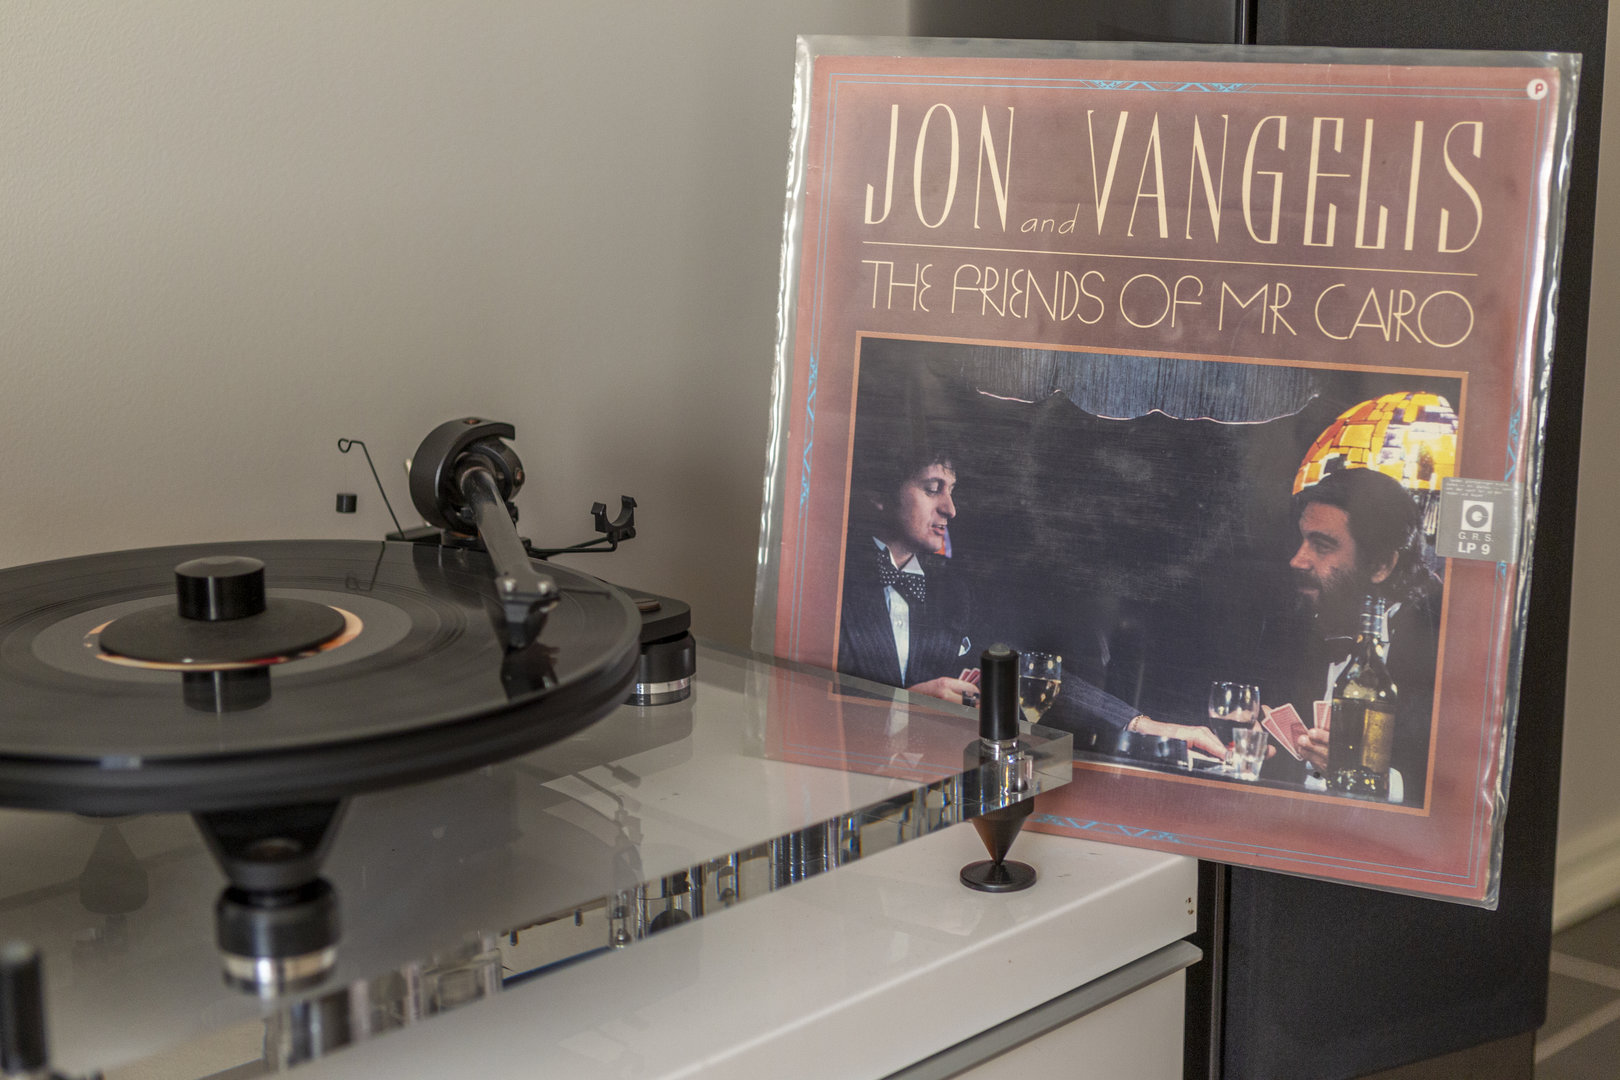 20210811 Jon & Vangelis - The Friend of Mr Cairo 1981.jpg